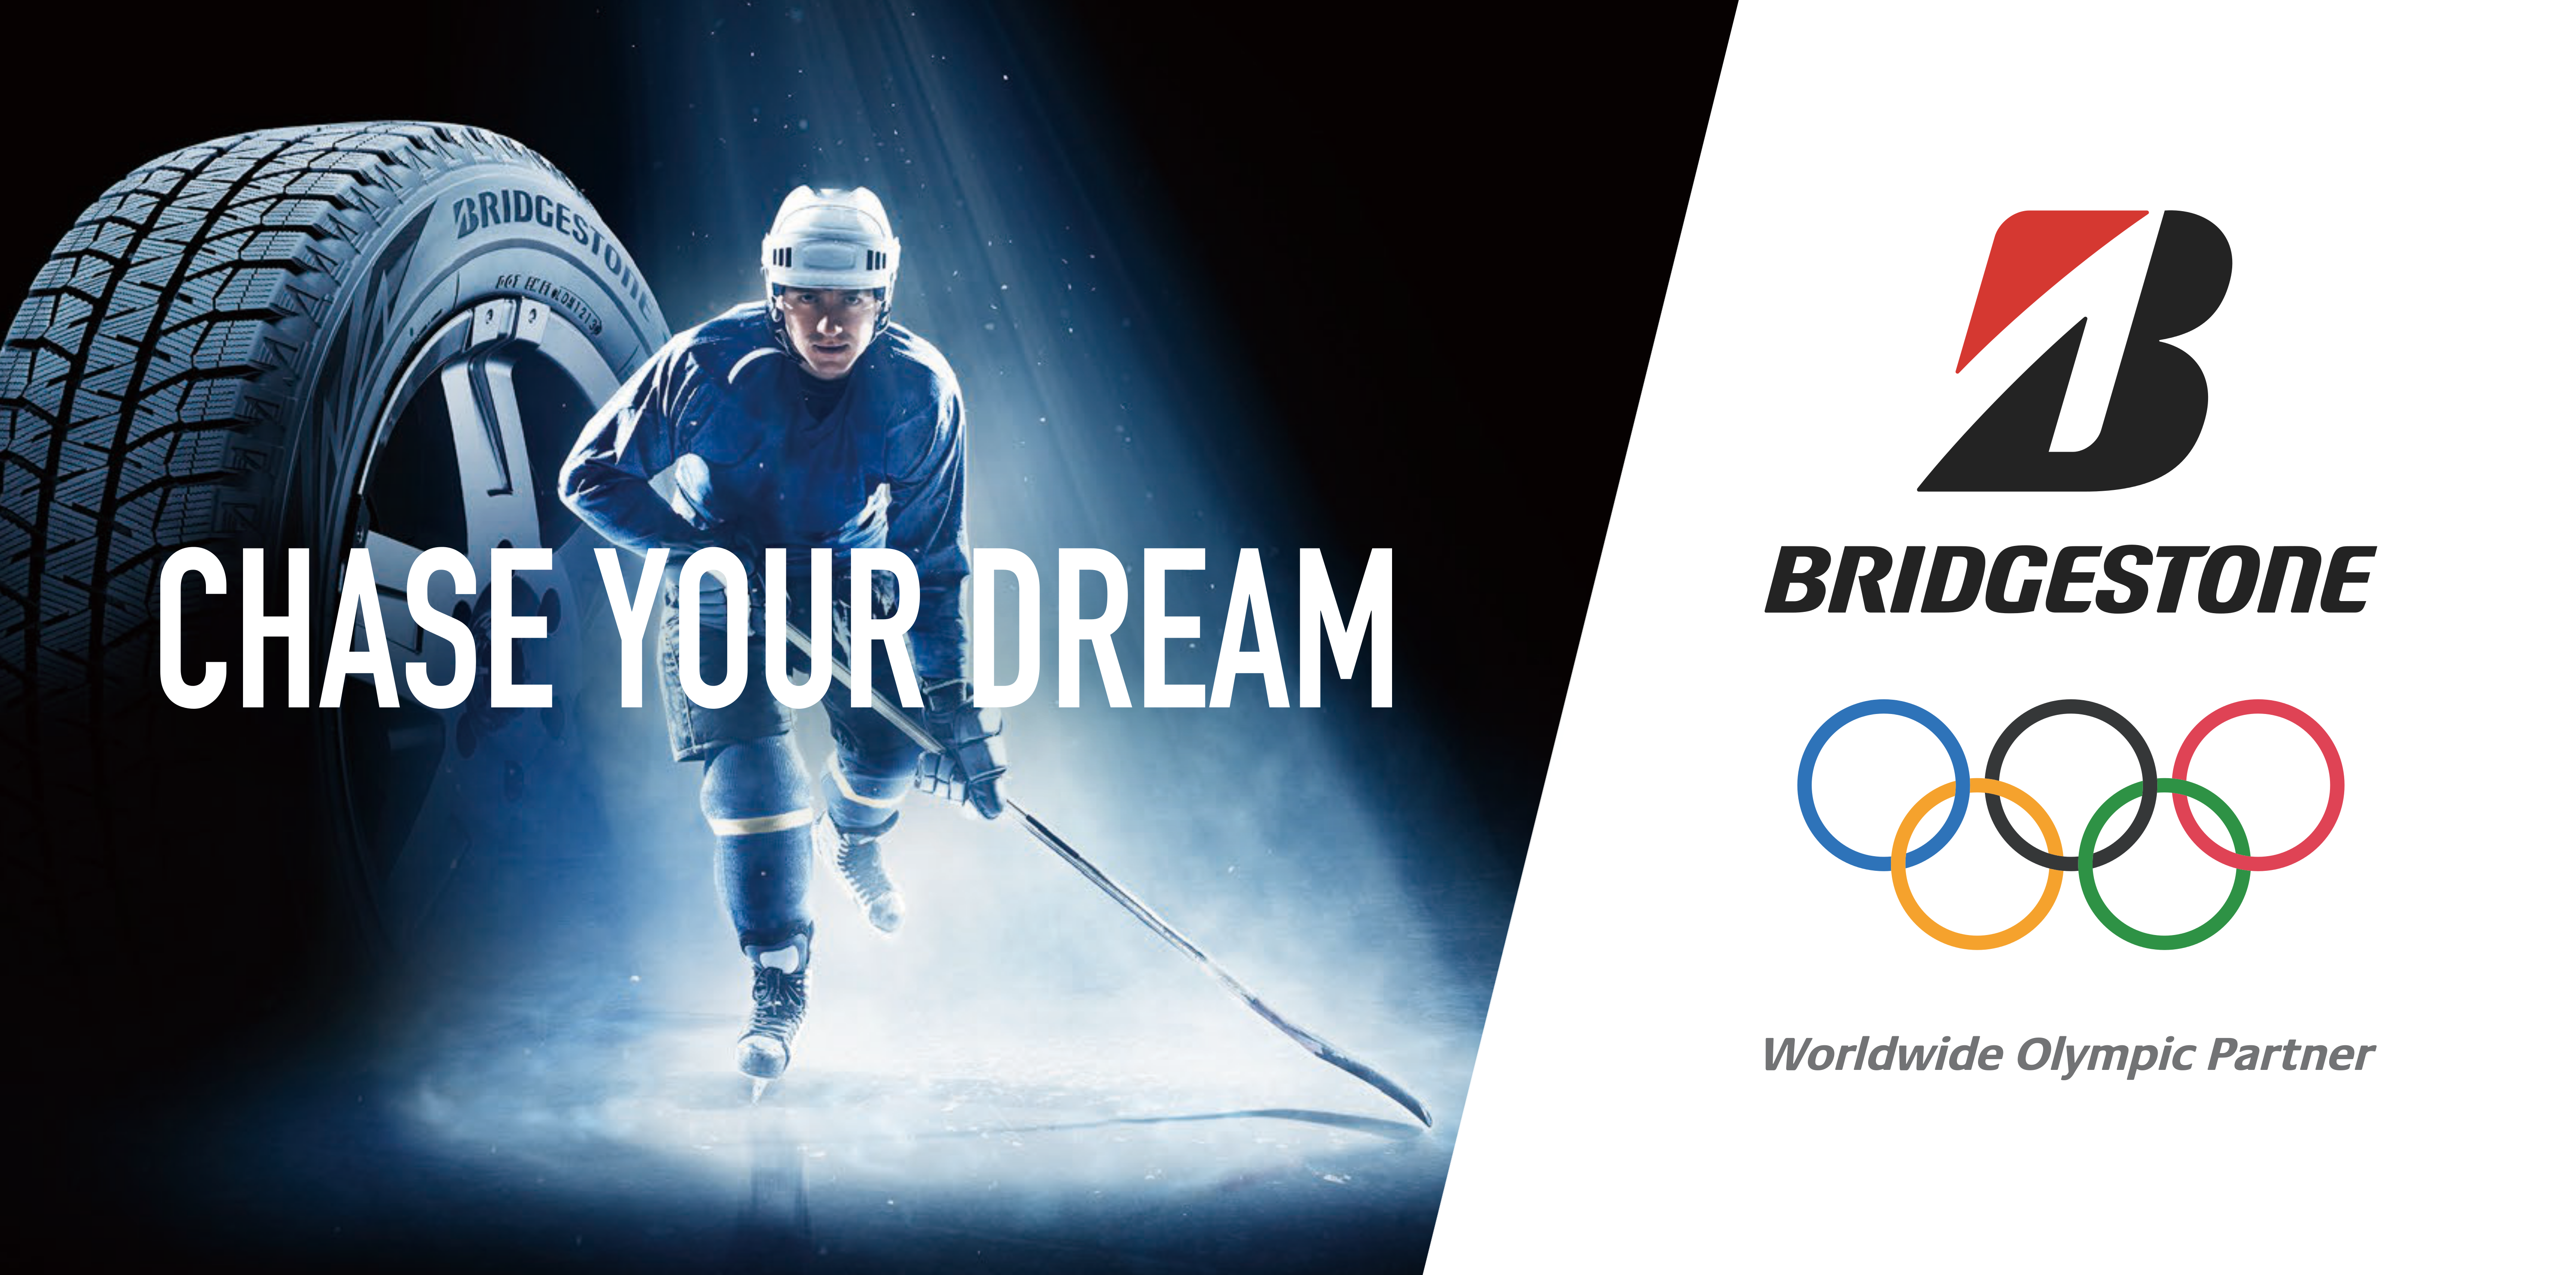 Bridgestone Kampagne Chase Your Dream PyeongChang 2018